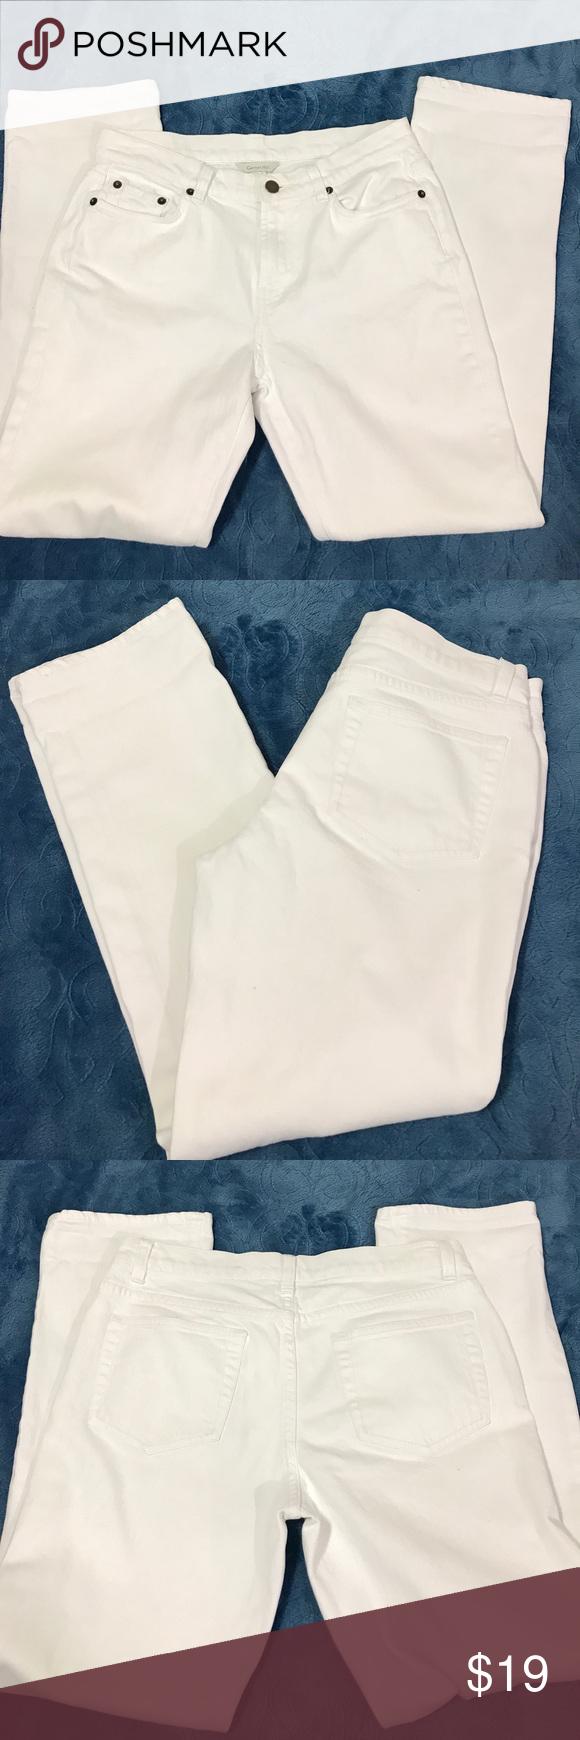 Garnet Hill white straight jeans 8 P Garnet Hill white straight leg jeans EUC 8P Garnet Hill Jeans Straight Leg